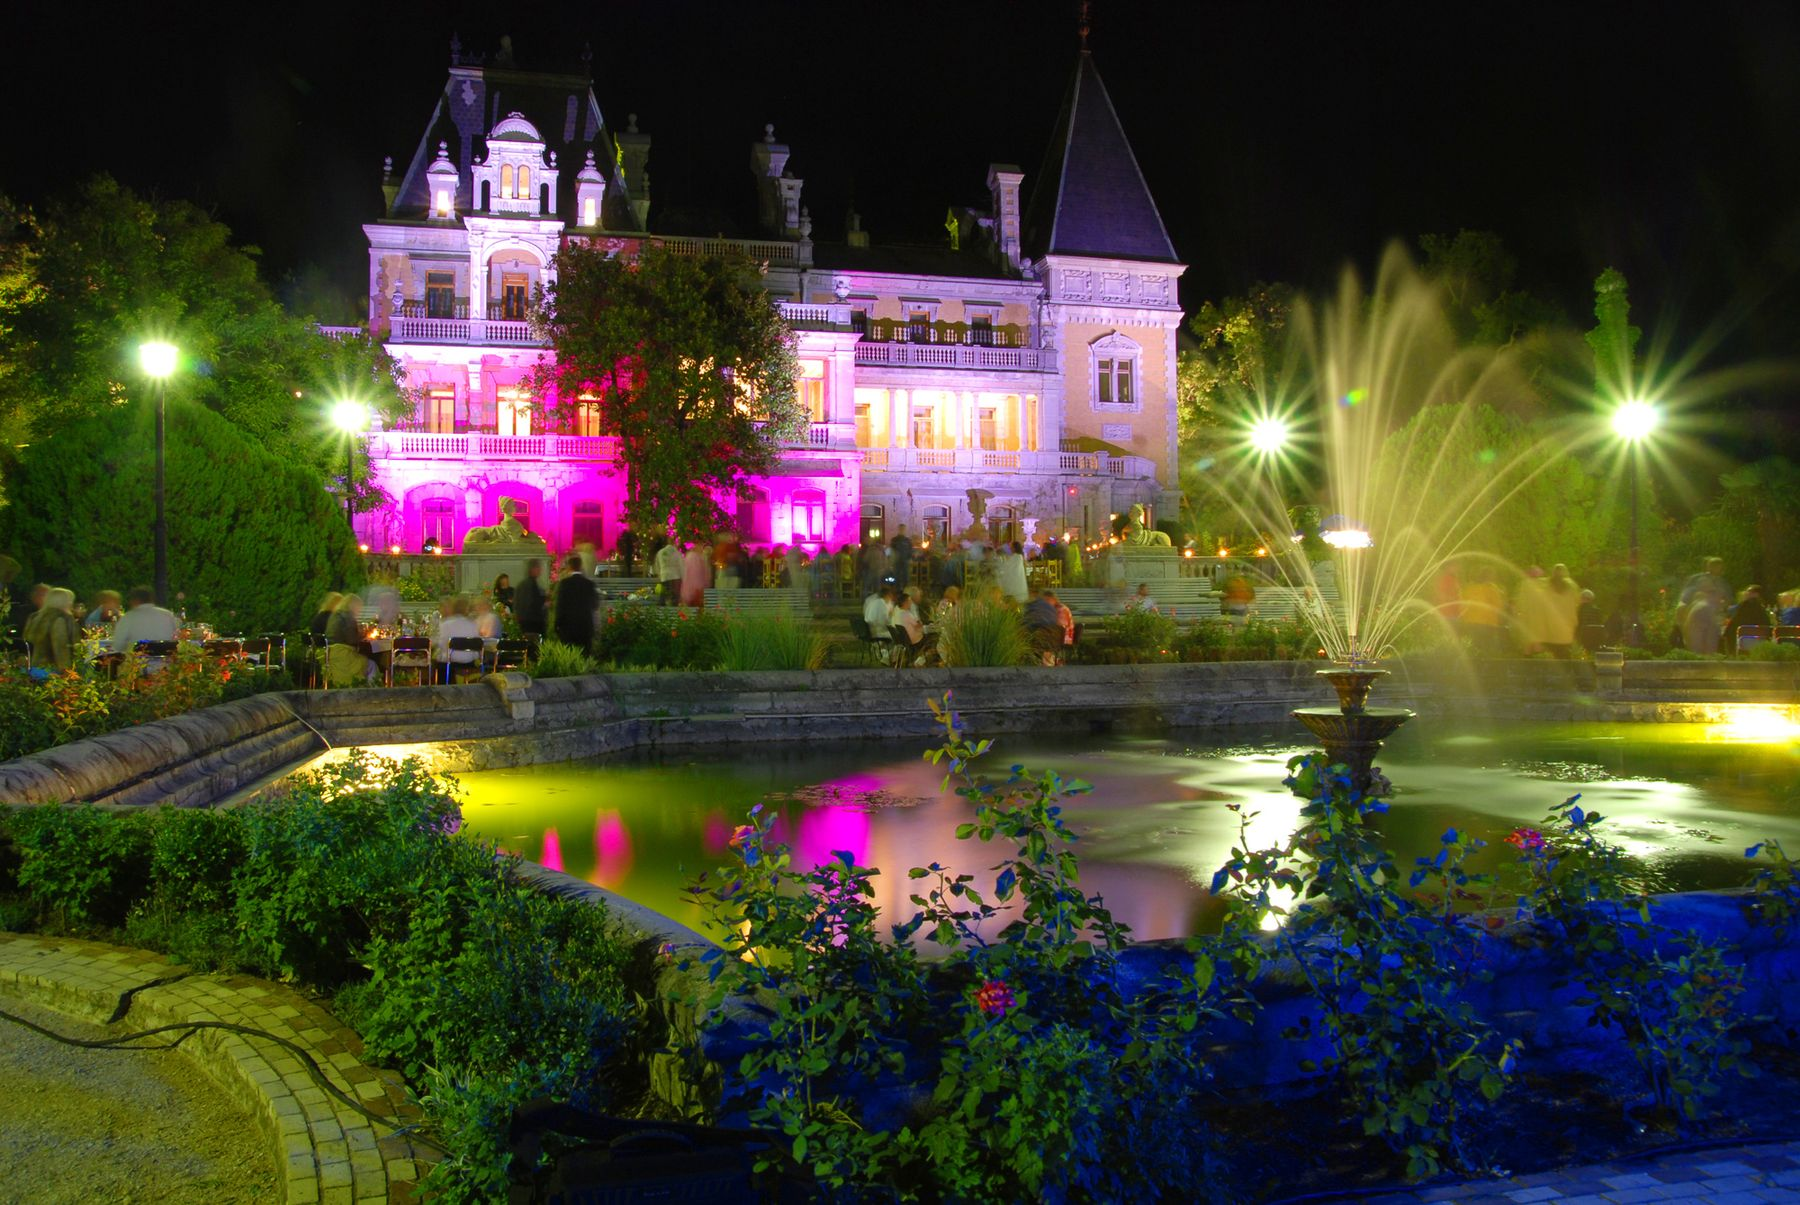 Массандровский дворец Массандра Массандровский дворец Царь Александр III Ялта Крым Романовы ночная